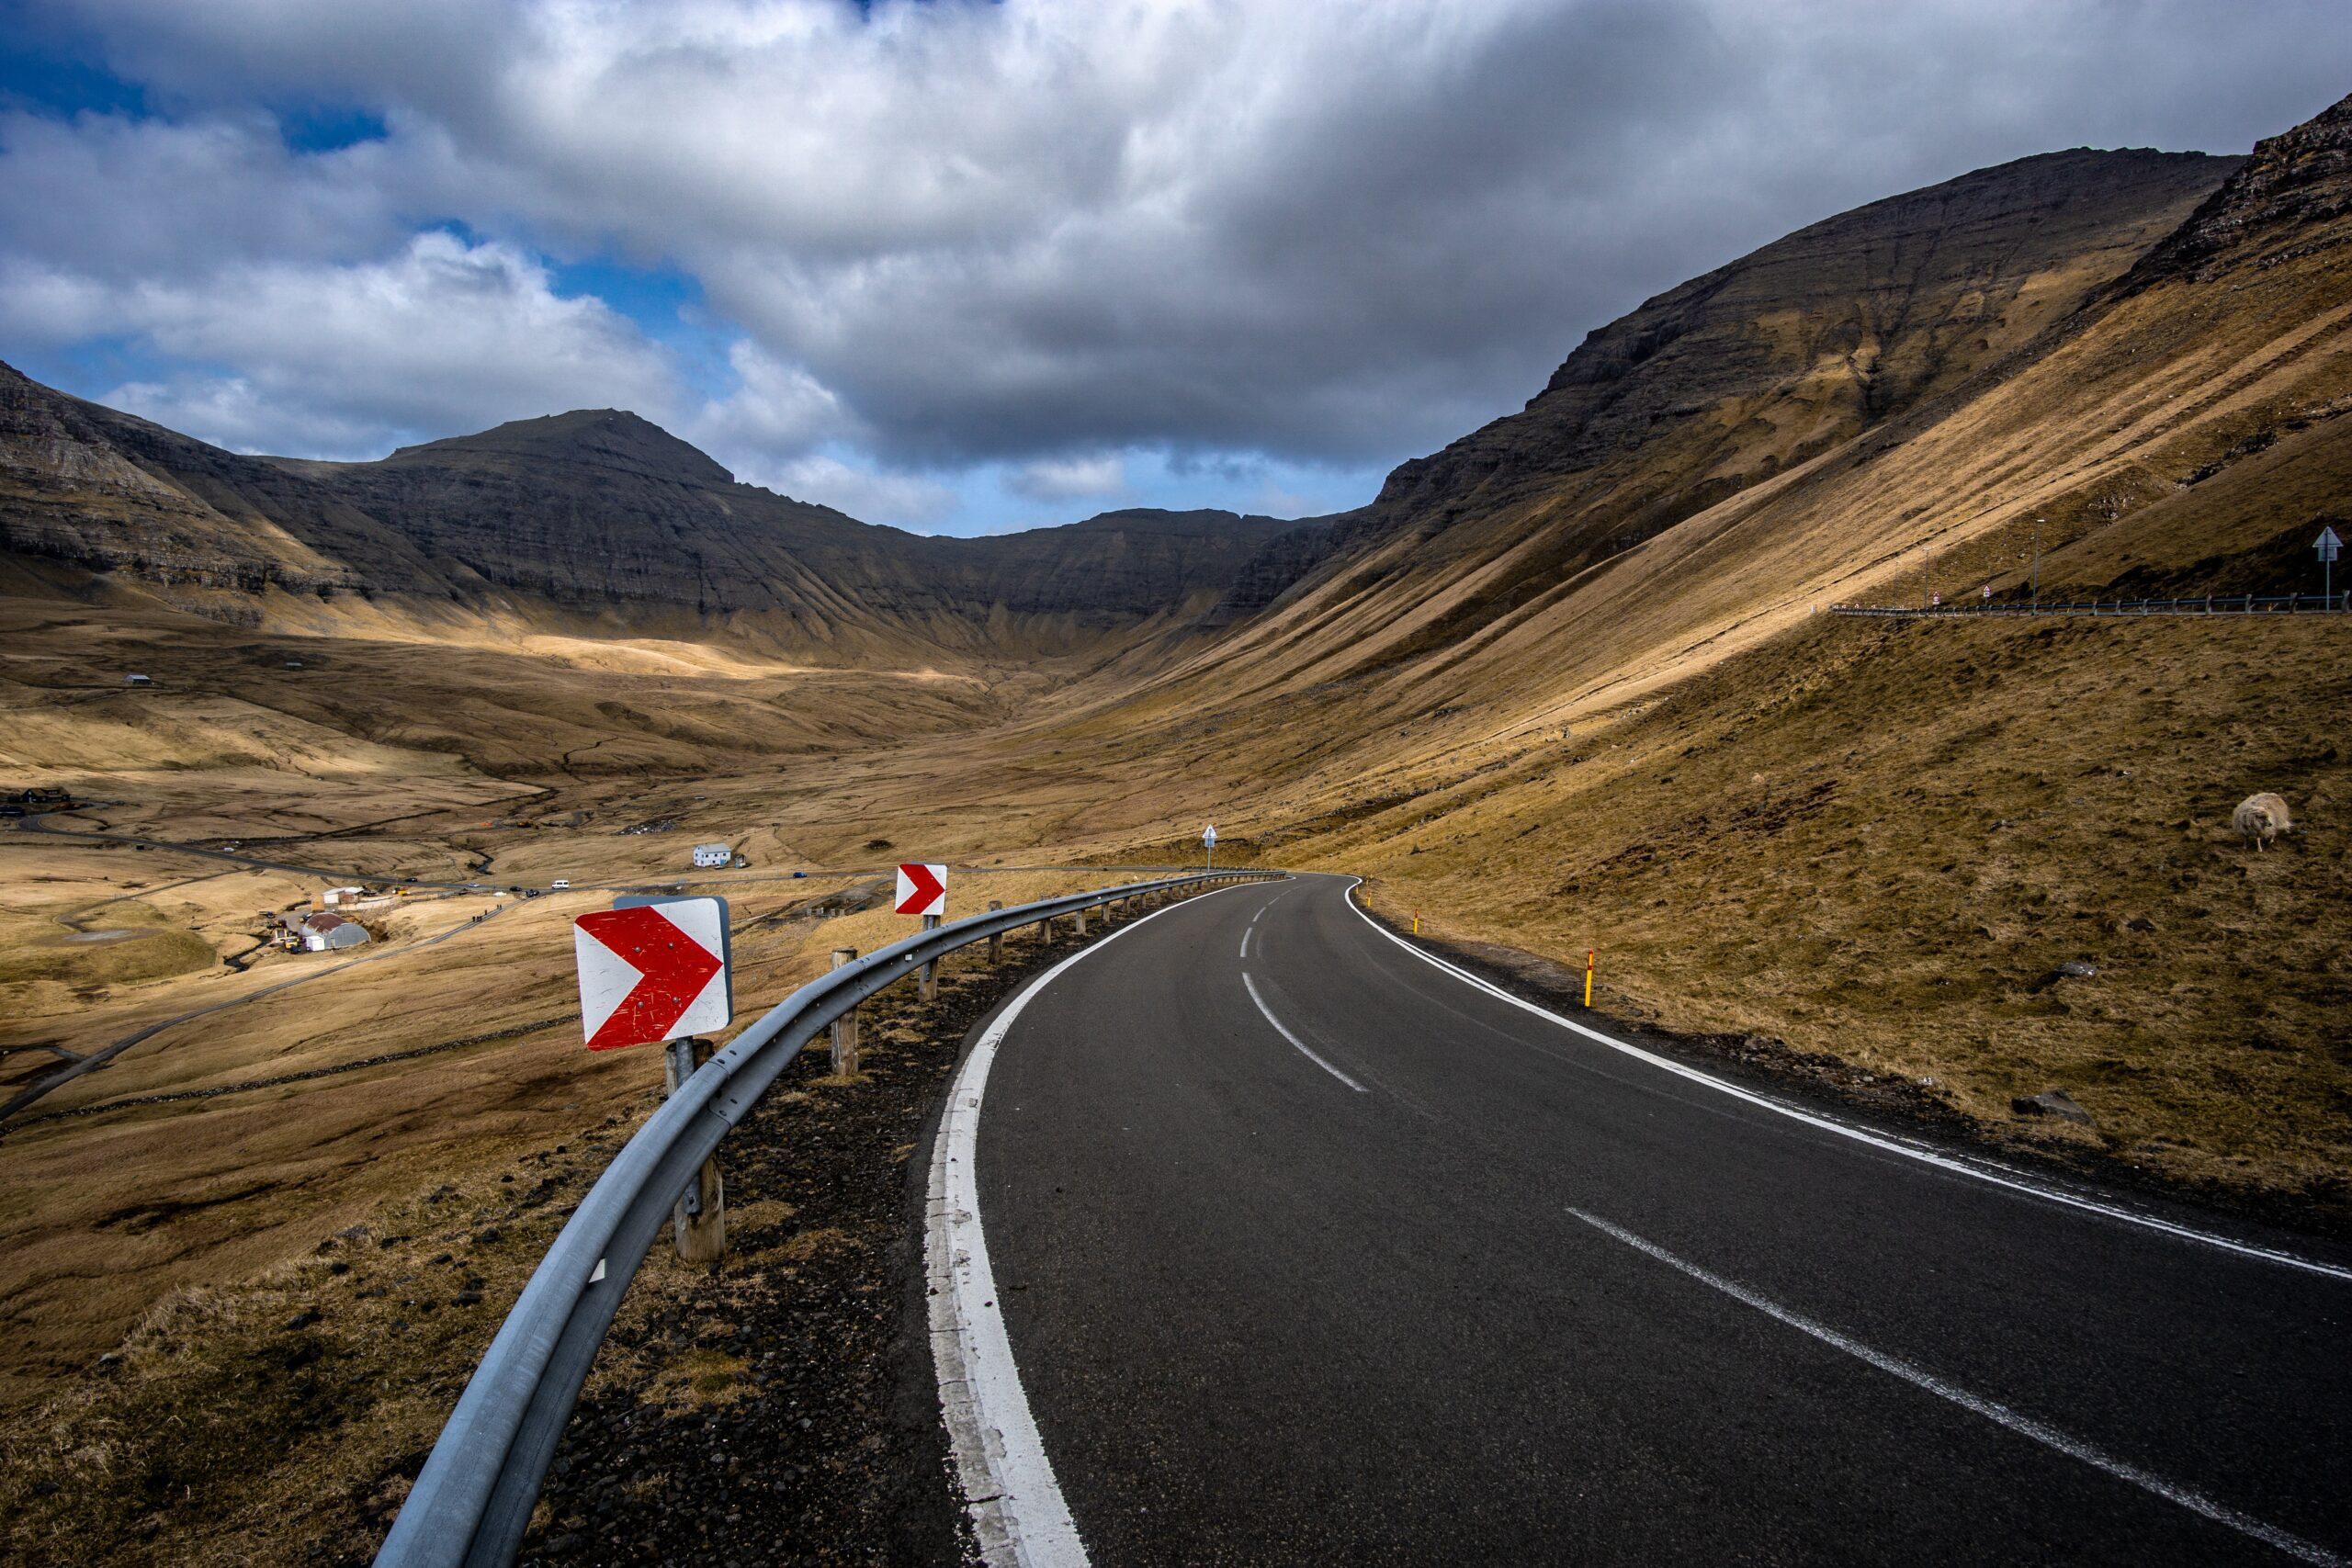 michael-fousert-blue highway through desert scape valley between pasture SW USA land-unsplash